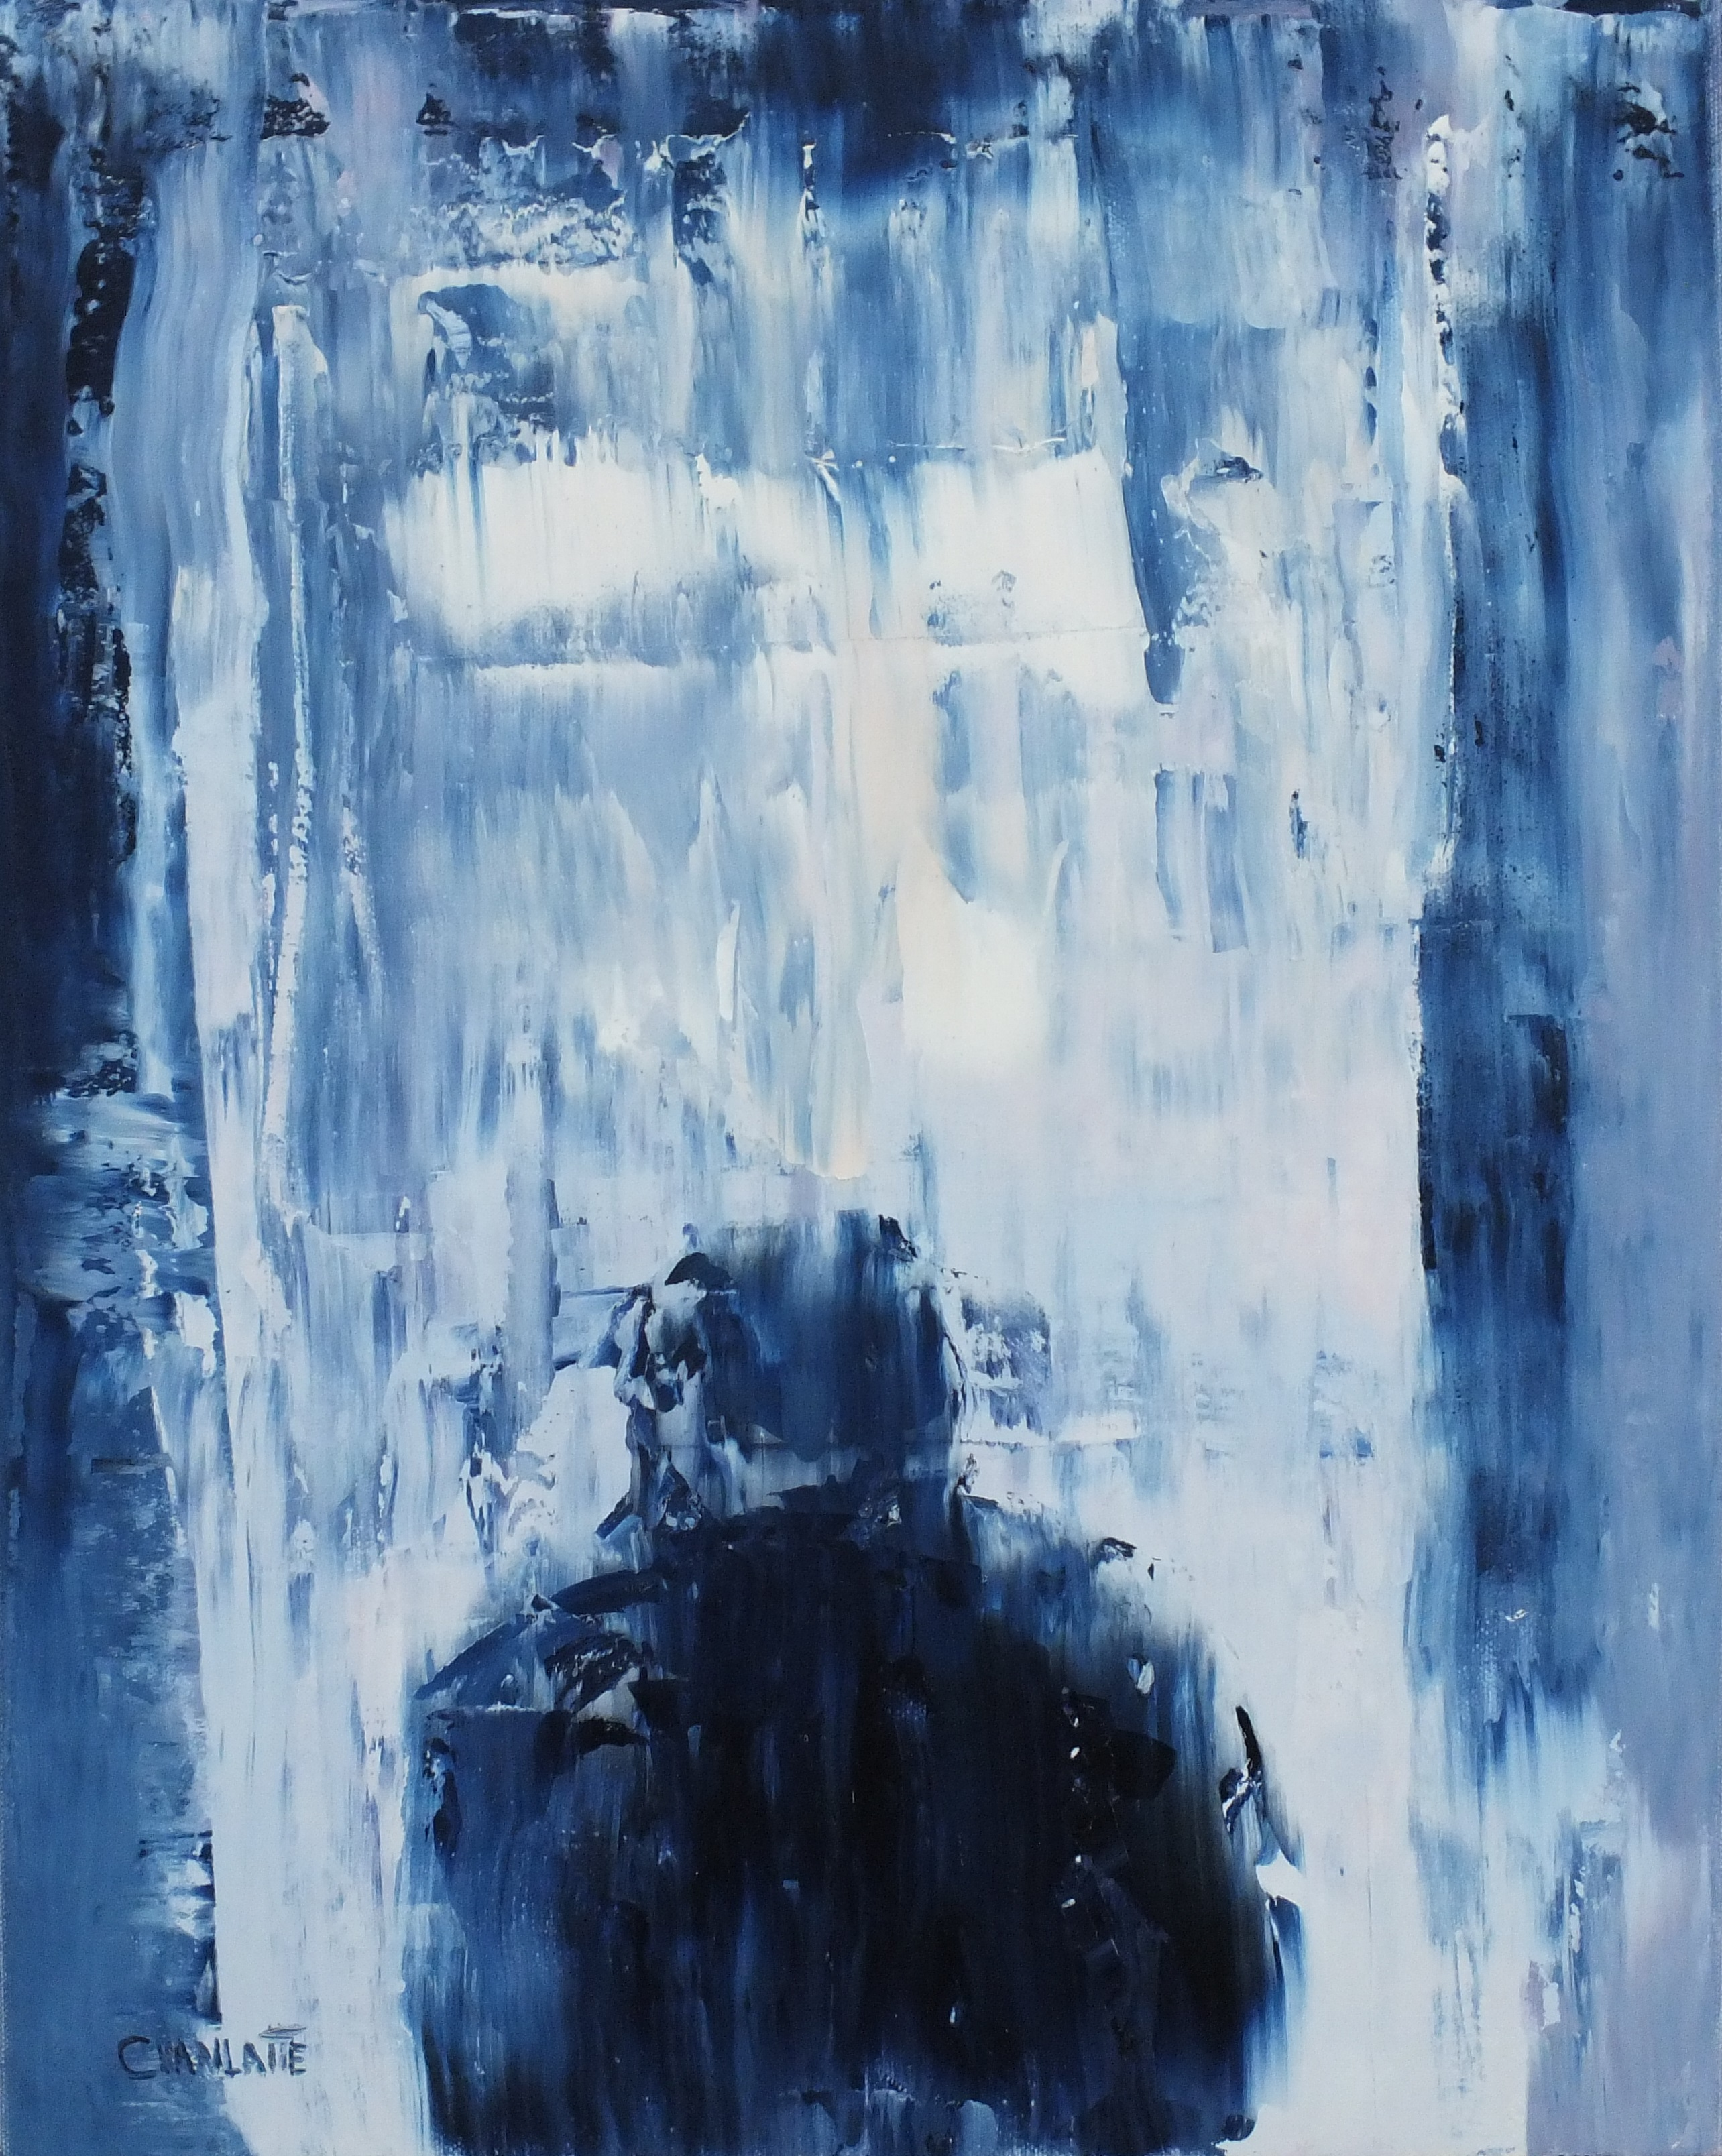 Marino Chanlatte Artwork Seeking The Light 2 Original